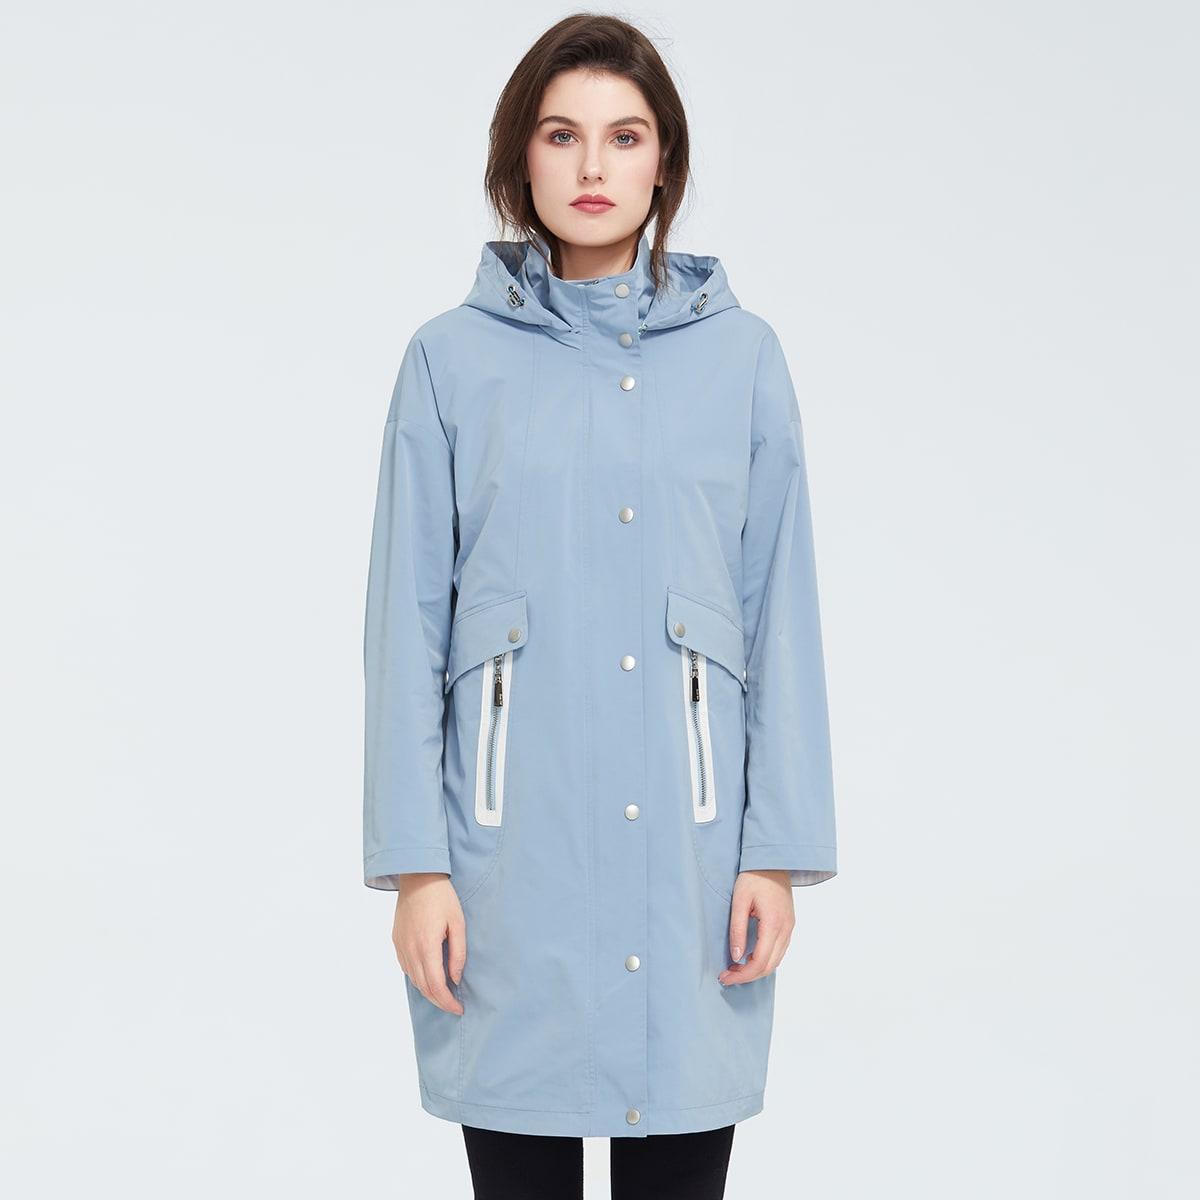 Zipper Pocket Drawstring Hooded Coat